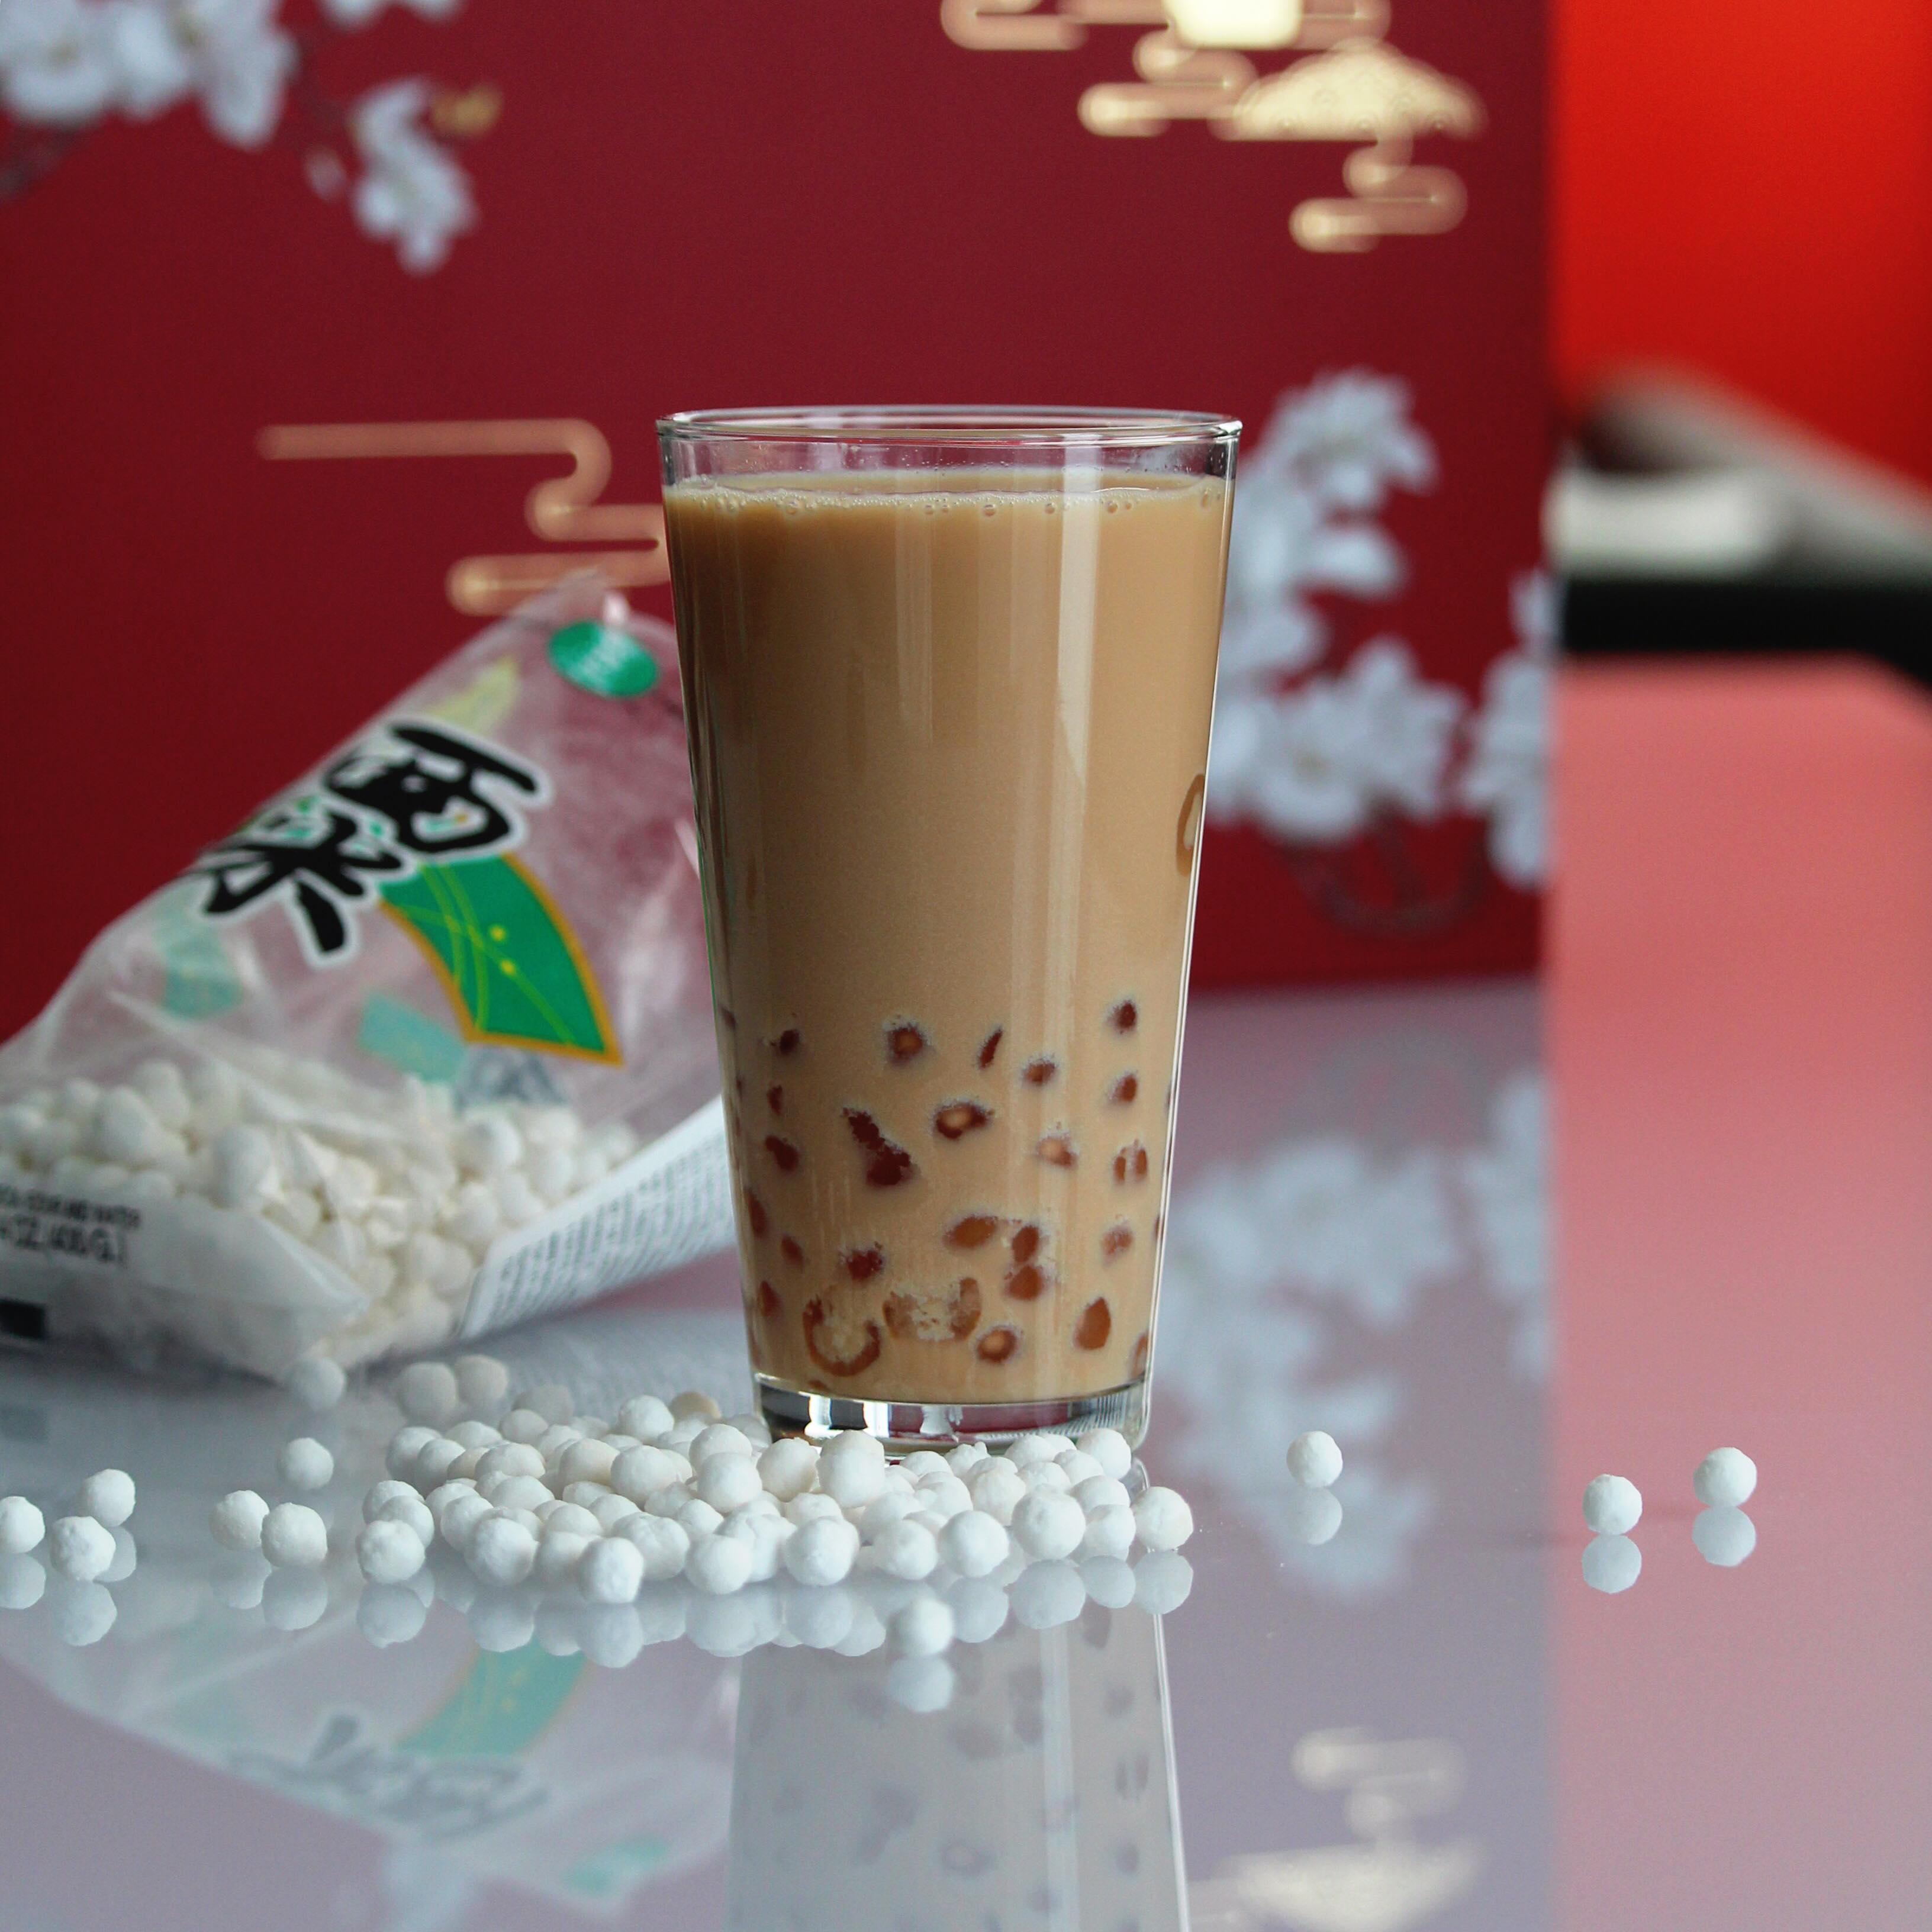 Boba (Coconut Milk Black Tea with Tapioca Pearls)